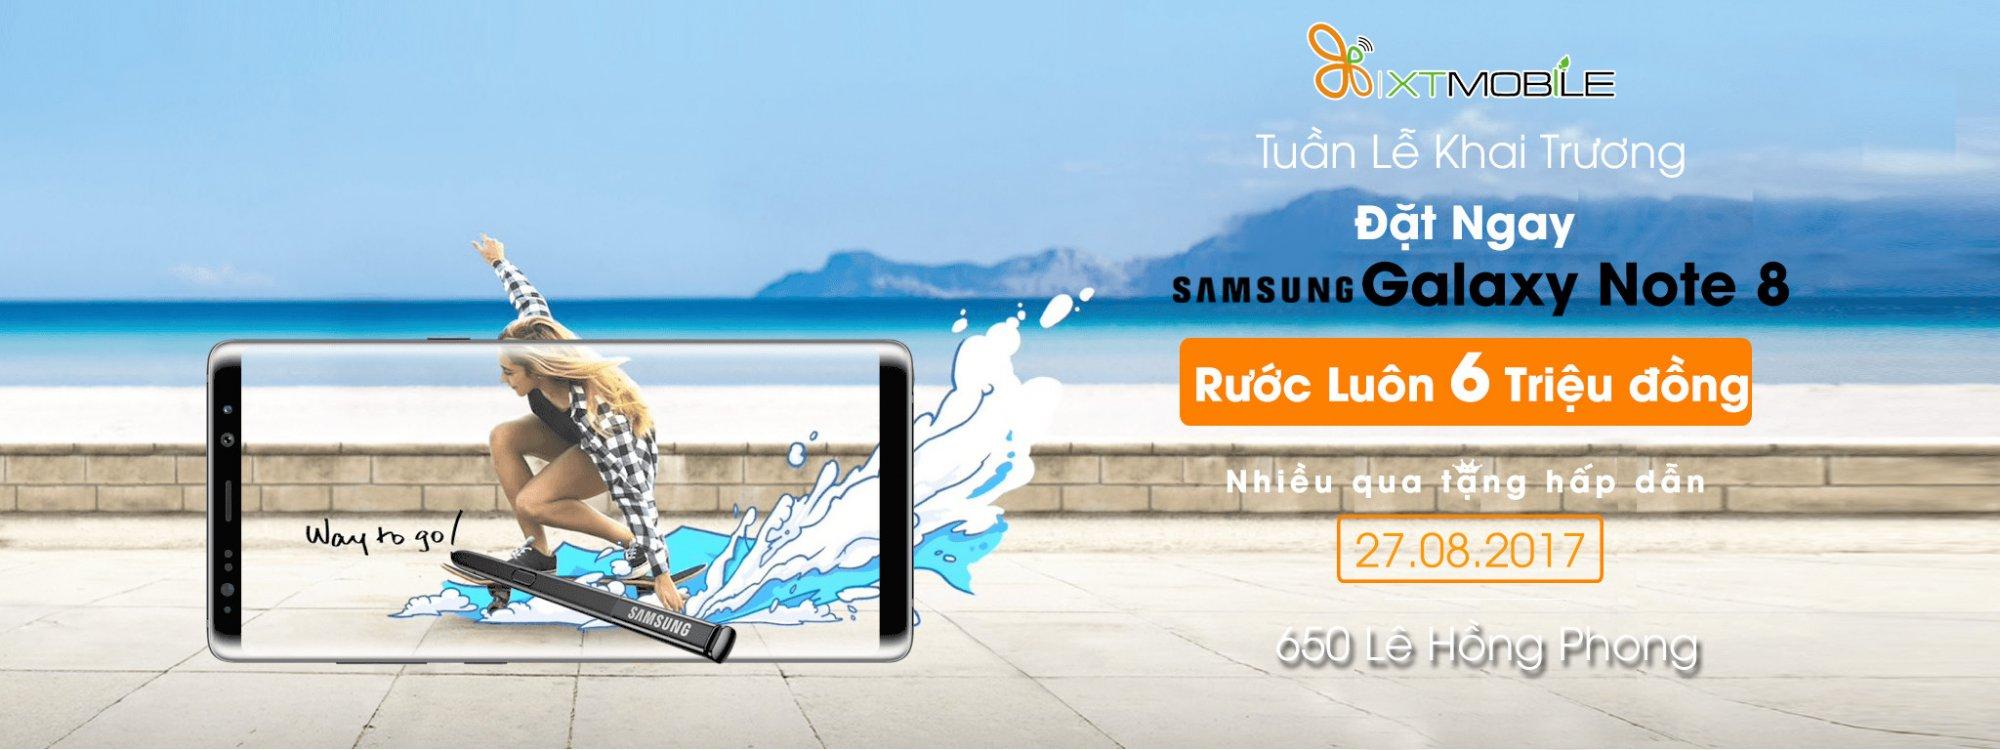 -re-opening-650-le-hong-phong-mua-iphone-6-gia-chi-650-000-vnd1